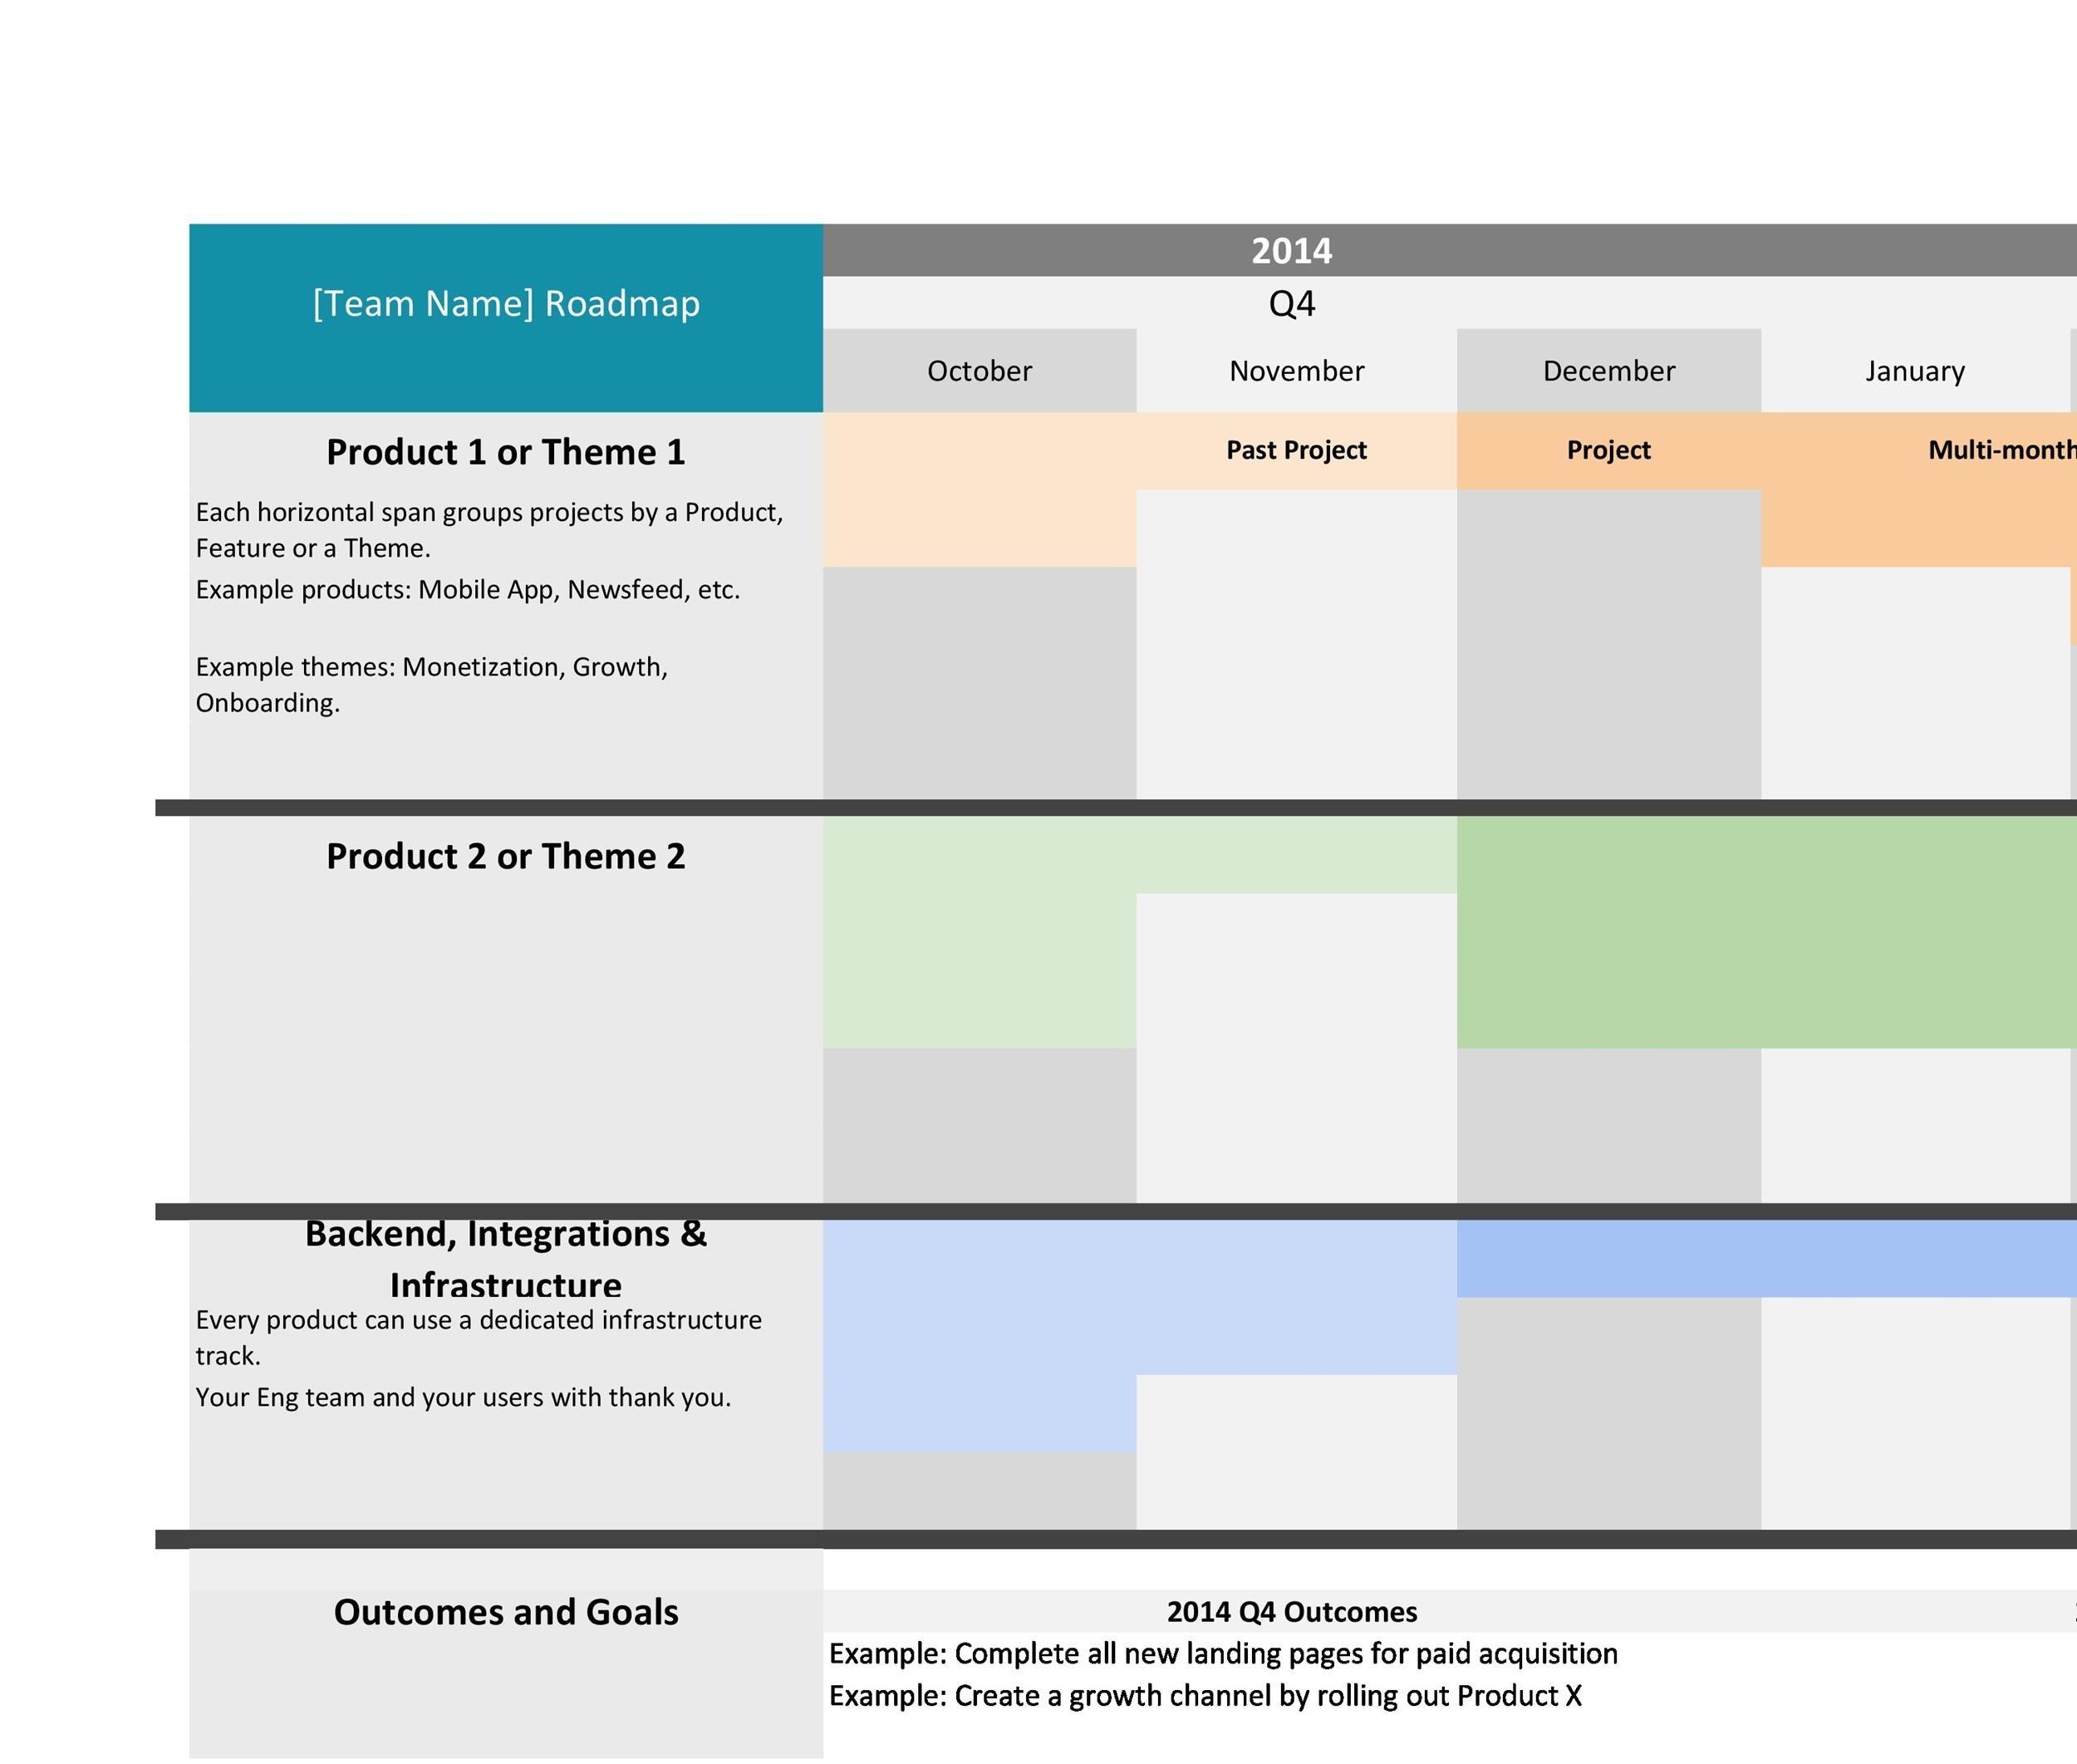 22 Visual Product Roadmap Templates  Tools - Template Lab - roadmap template